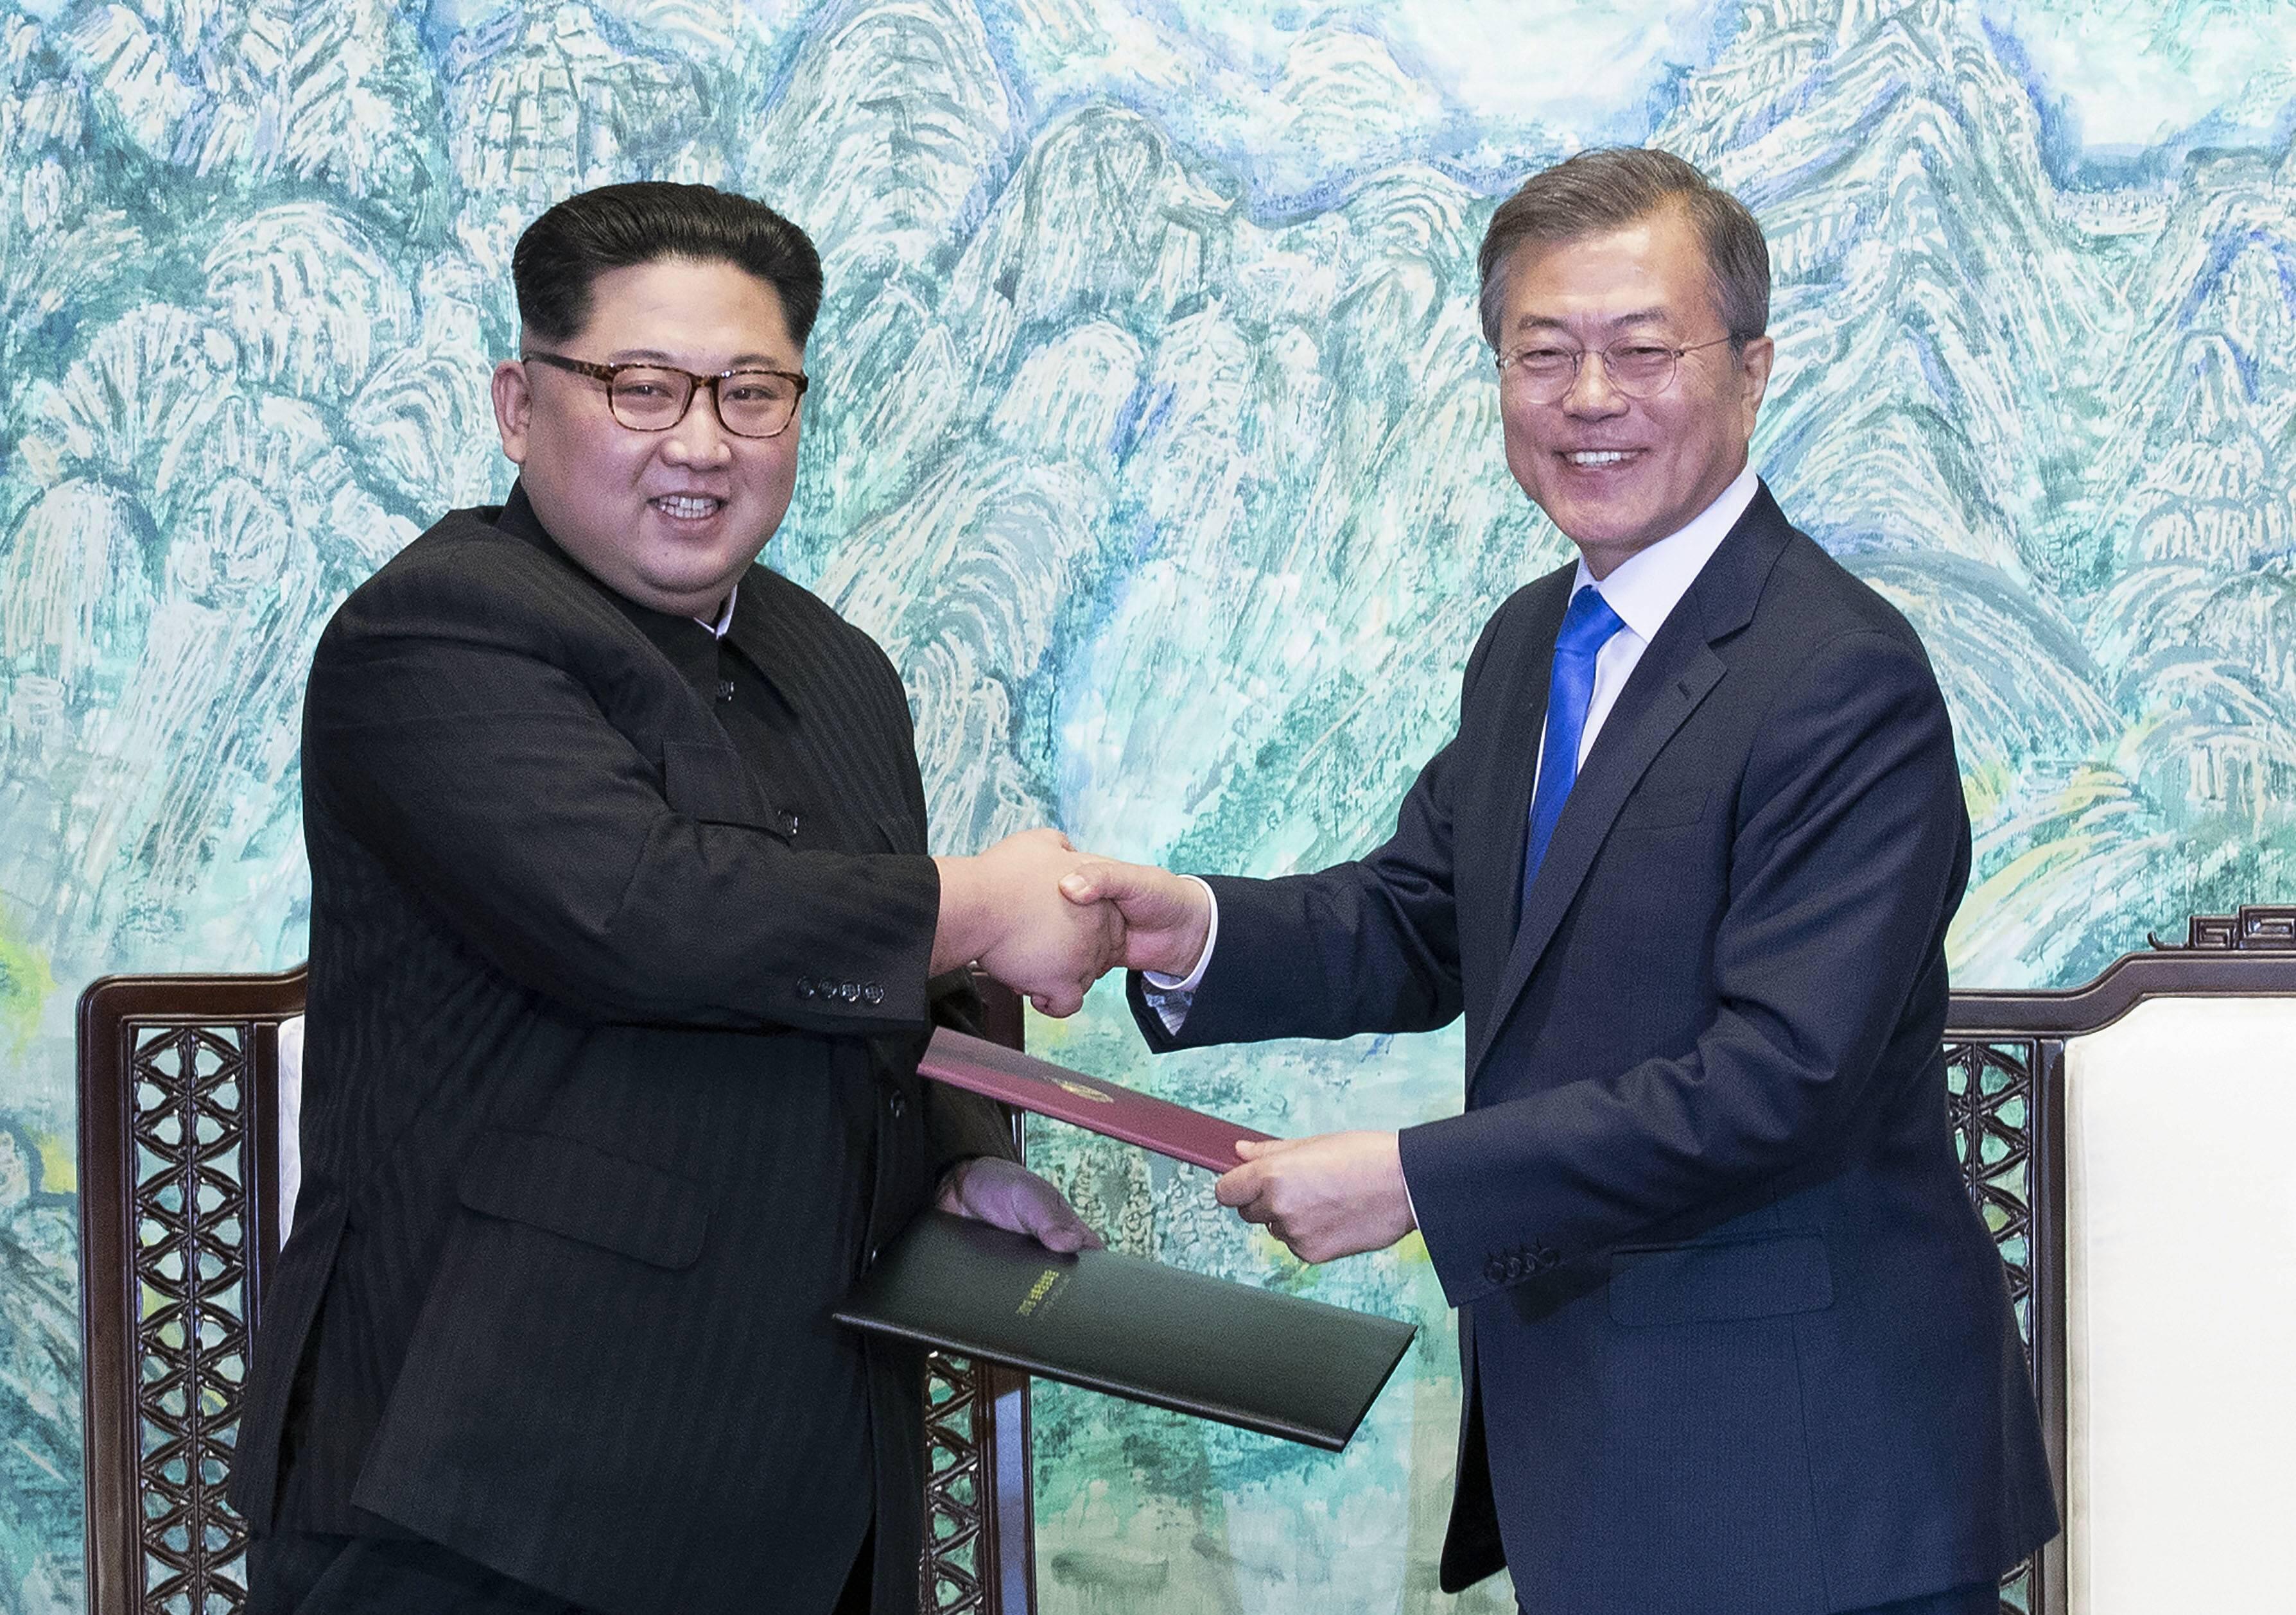 Bild zu Nordkorea, Südkorea, Panmunjom, Kim Jong Un